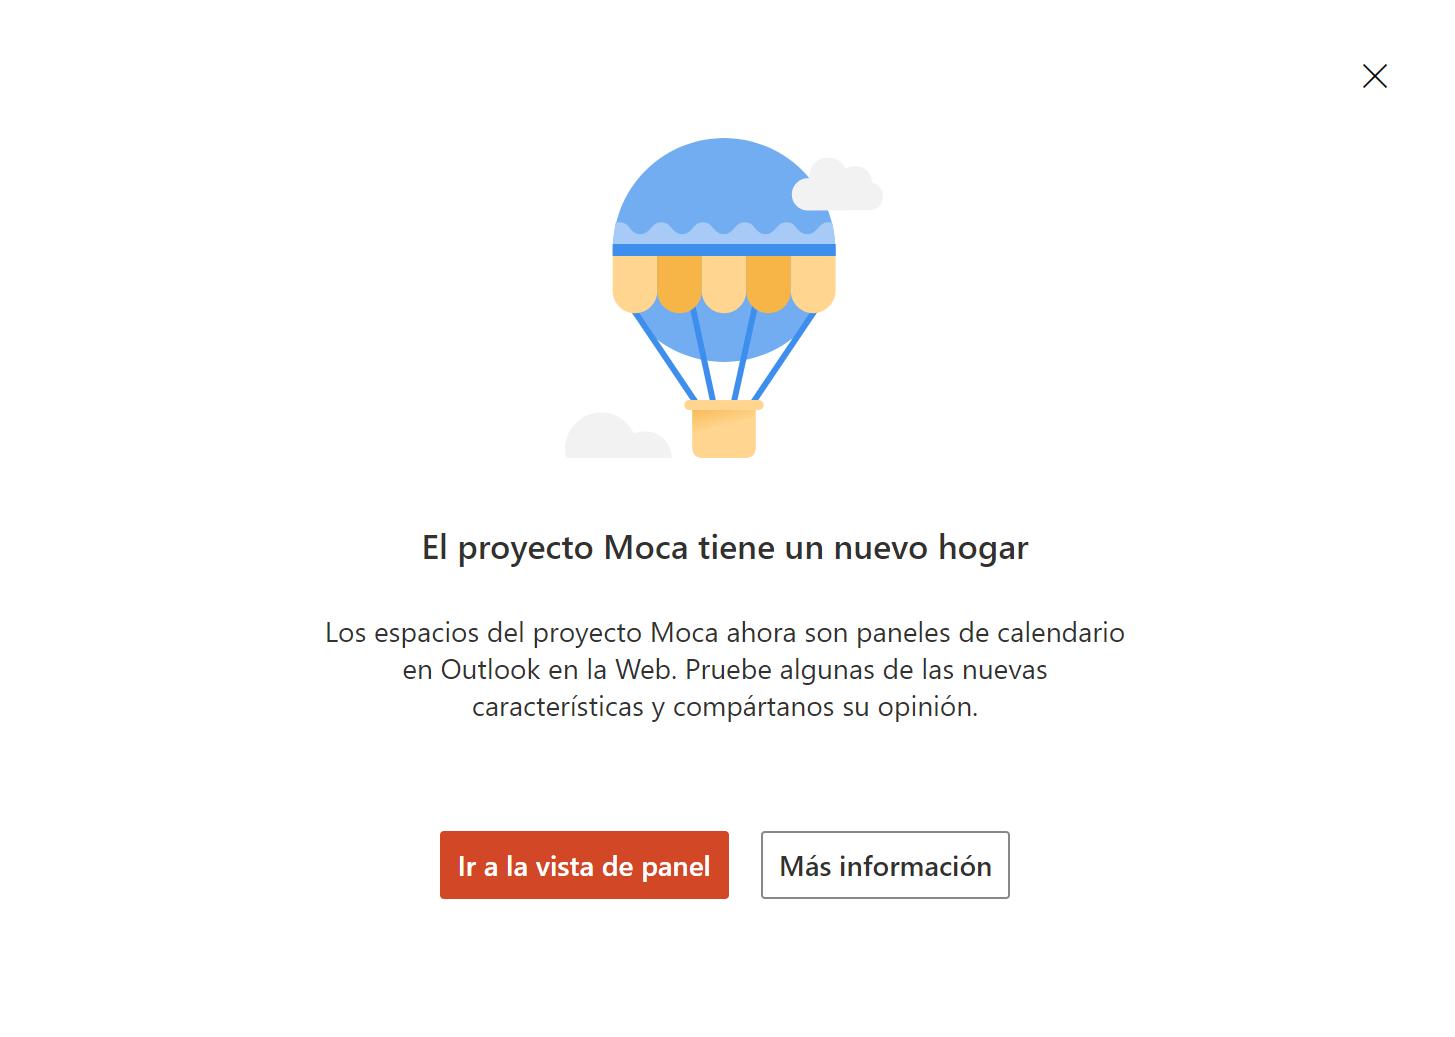 Project Moca se pasa al calendario de Outlook